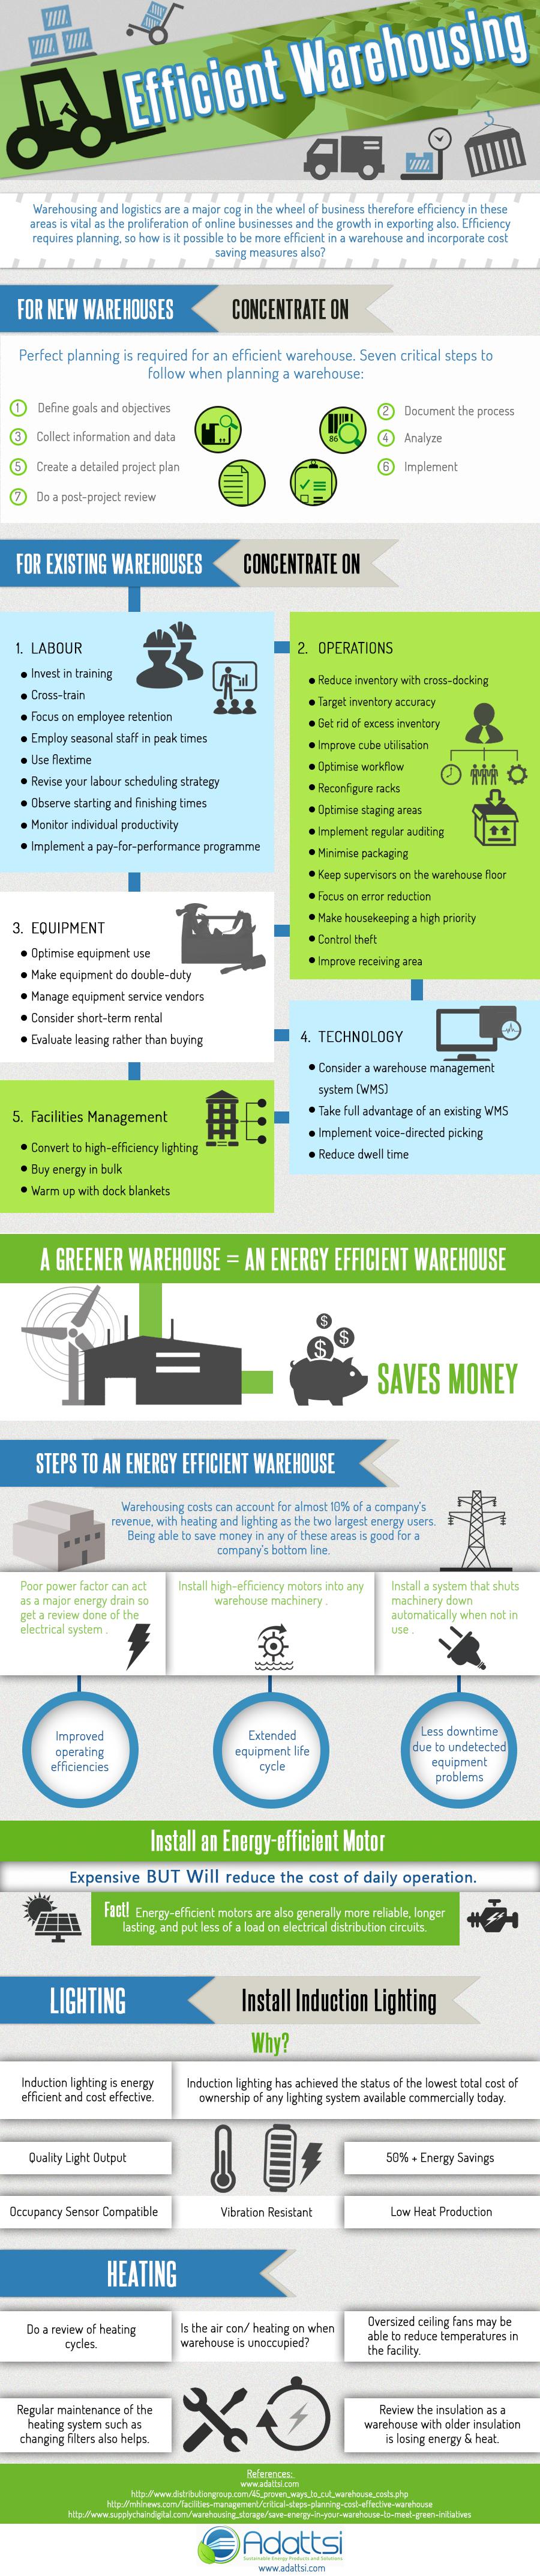 green_warehousing